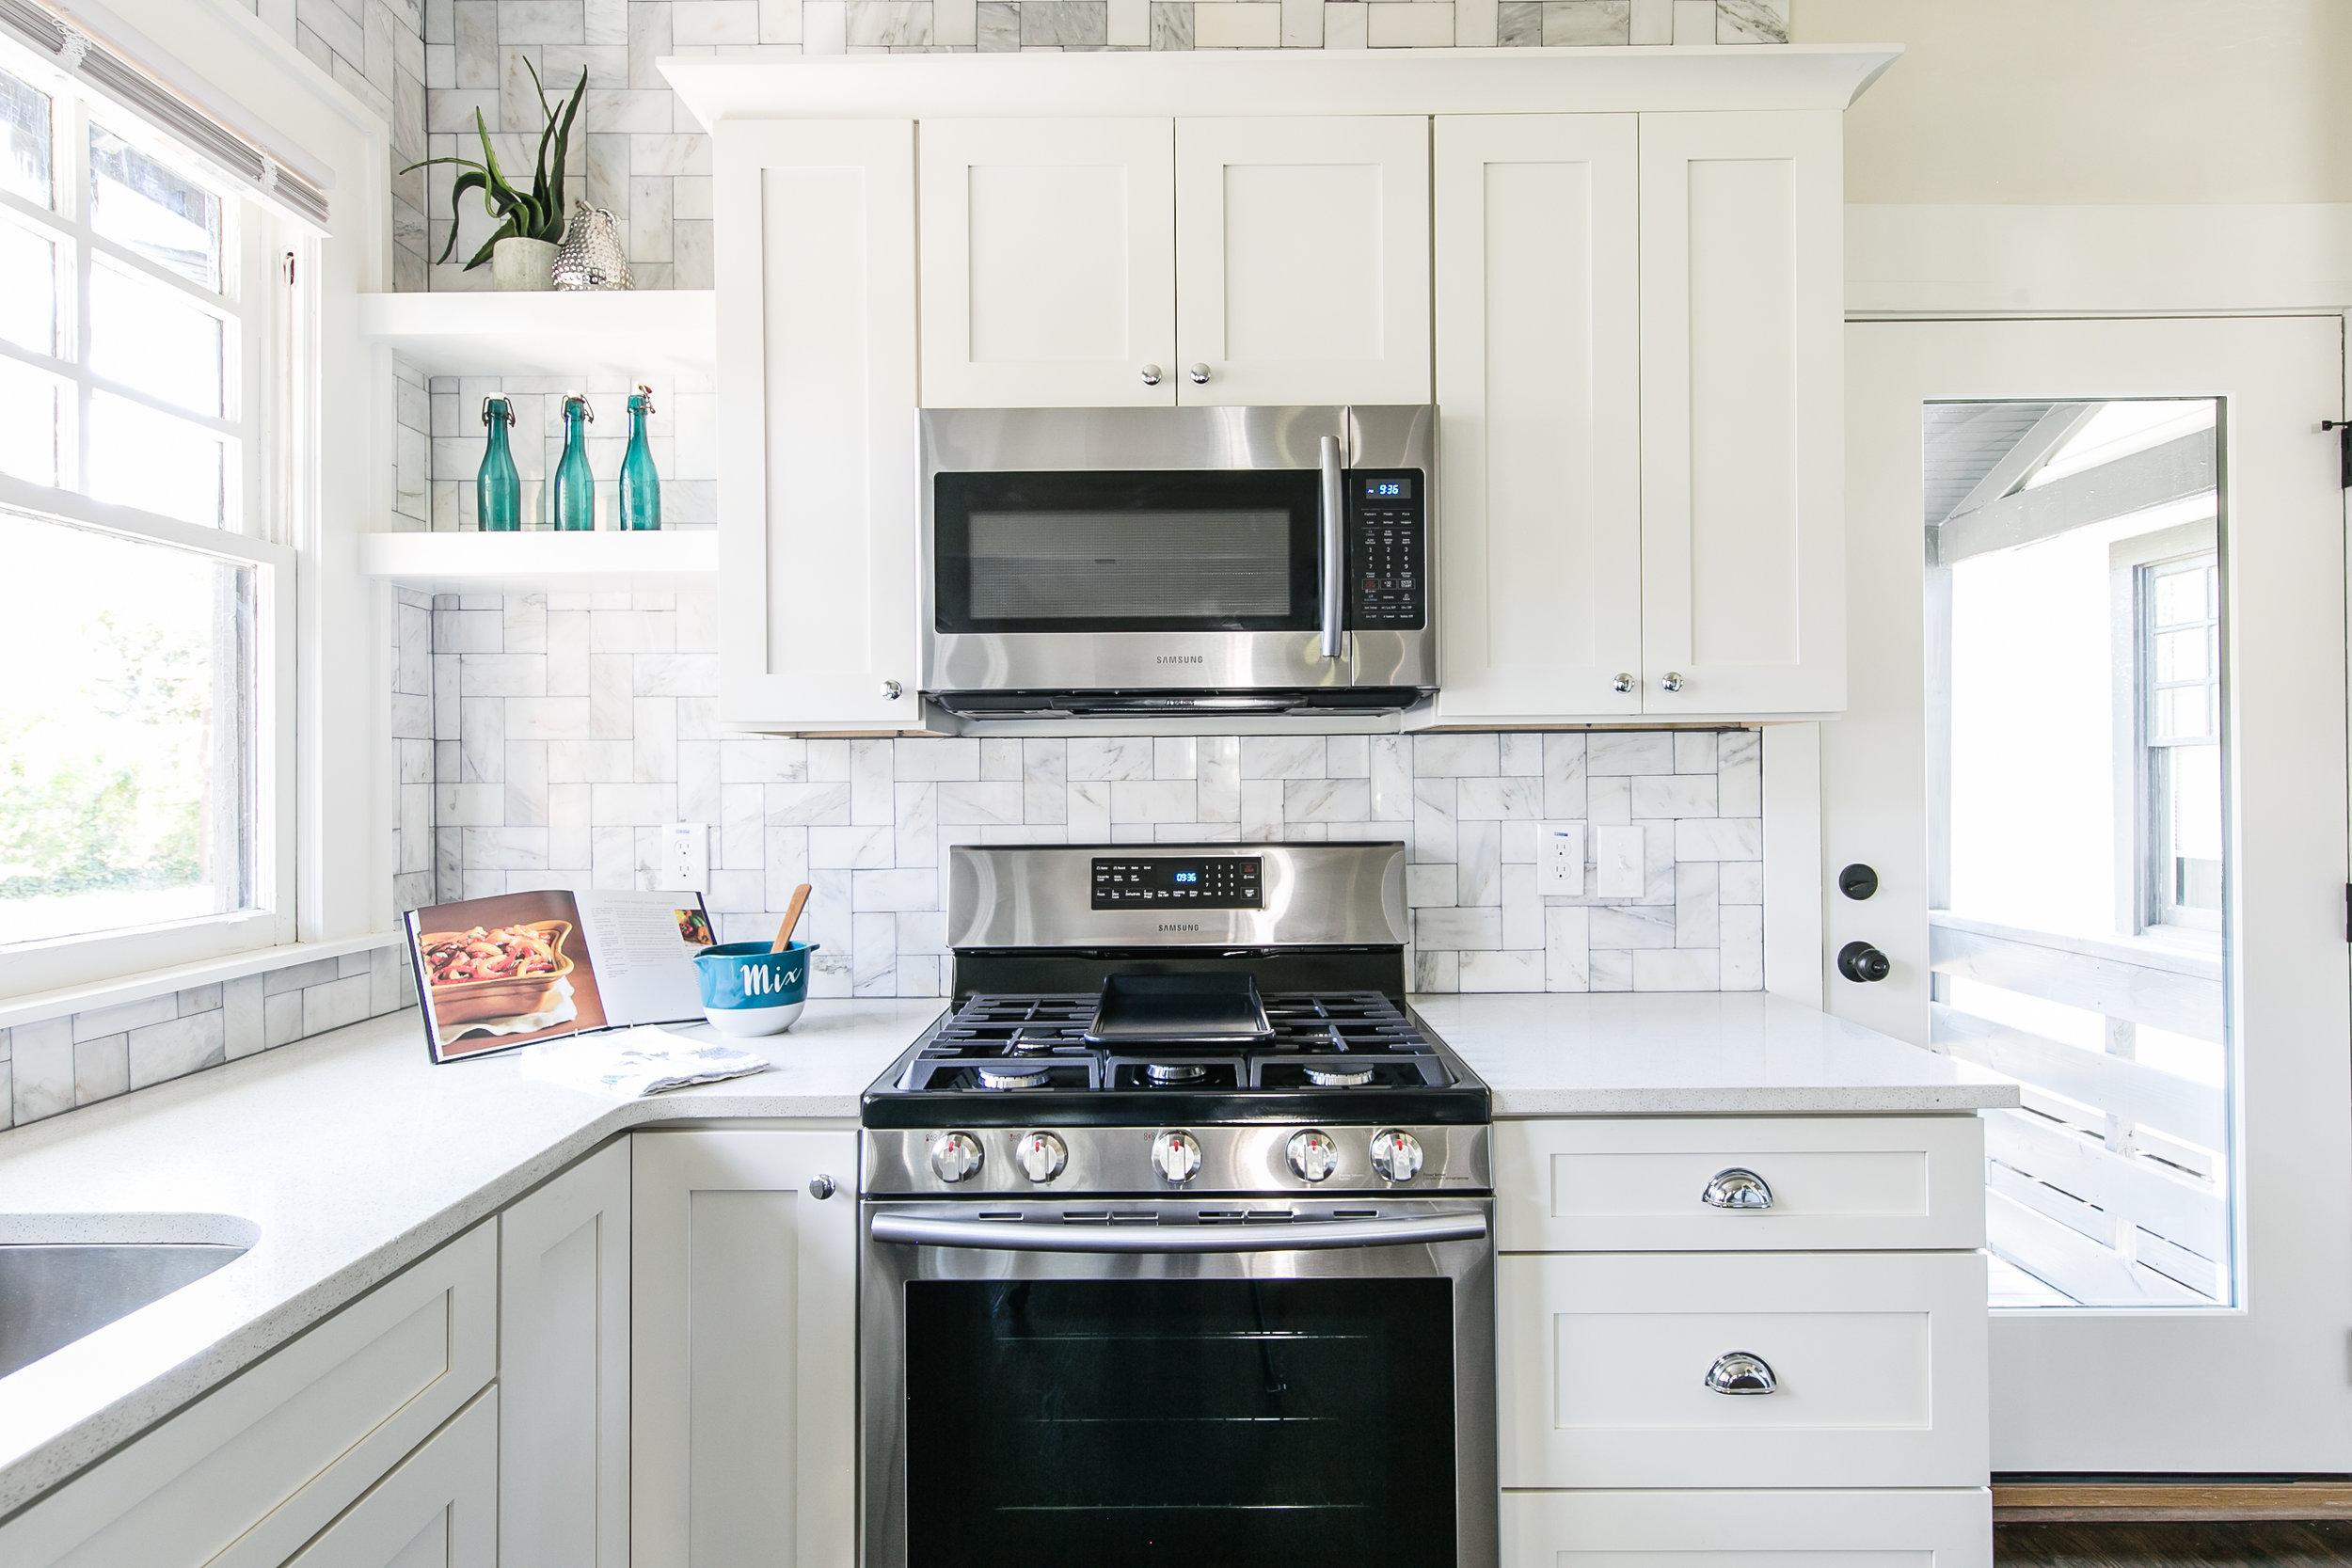 944 Beecher-Kitchen Stove.jpg